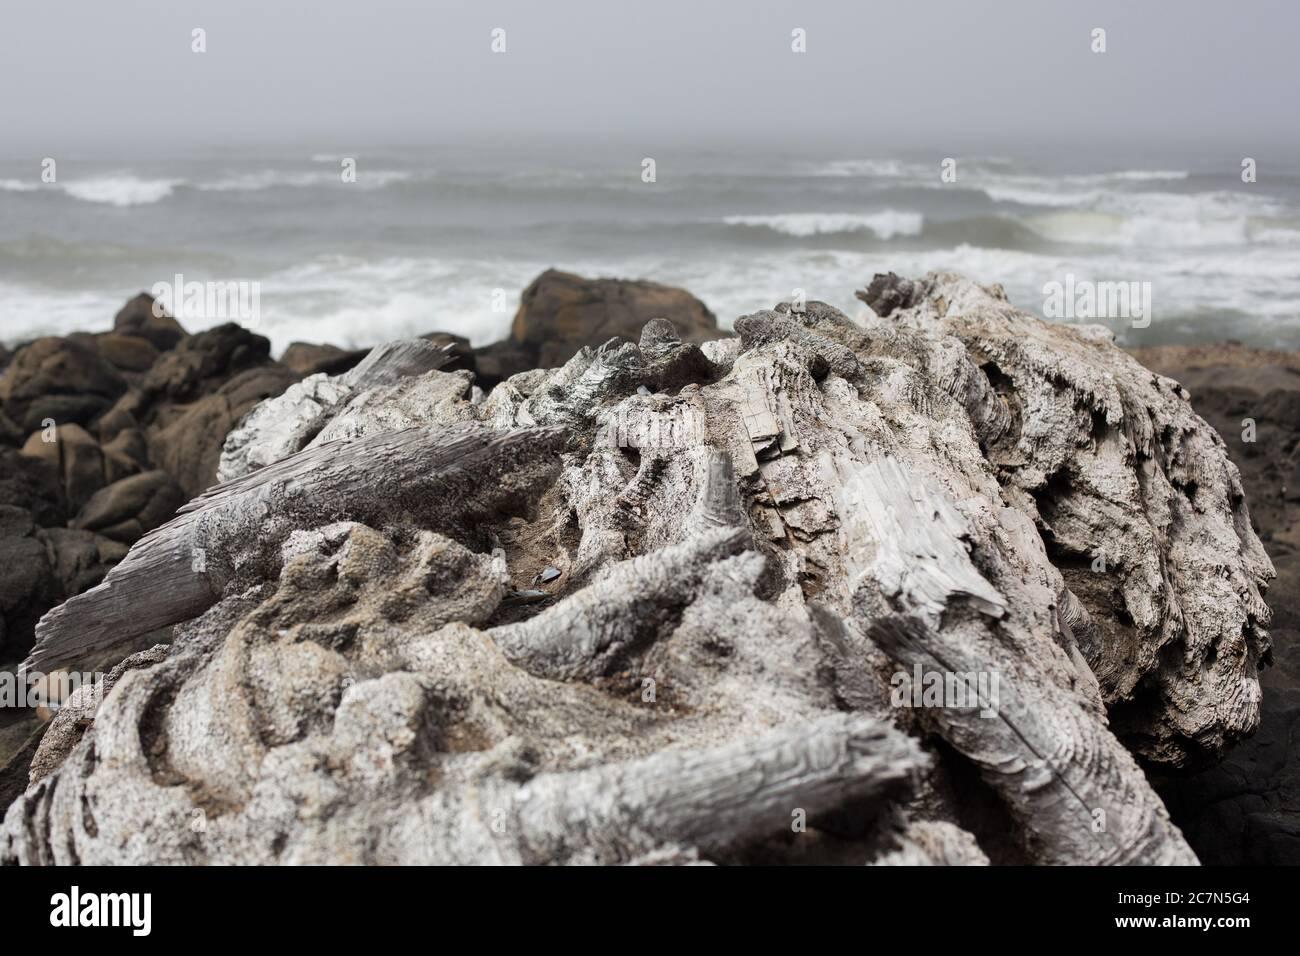 Driftwood a lo largo de la costa en Yachats, Oregon, EE.UU. Foto de stock